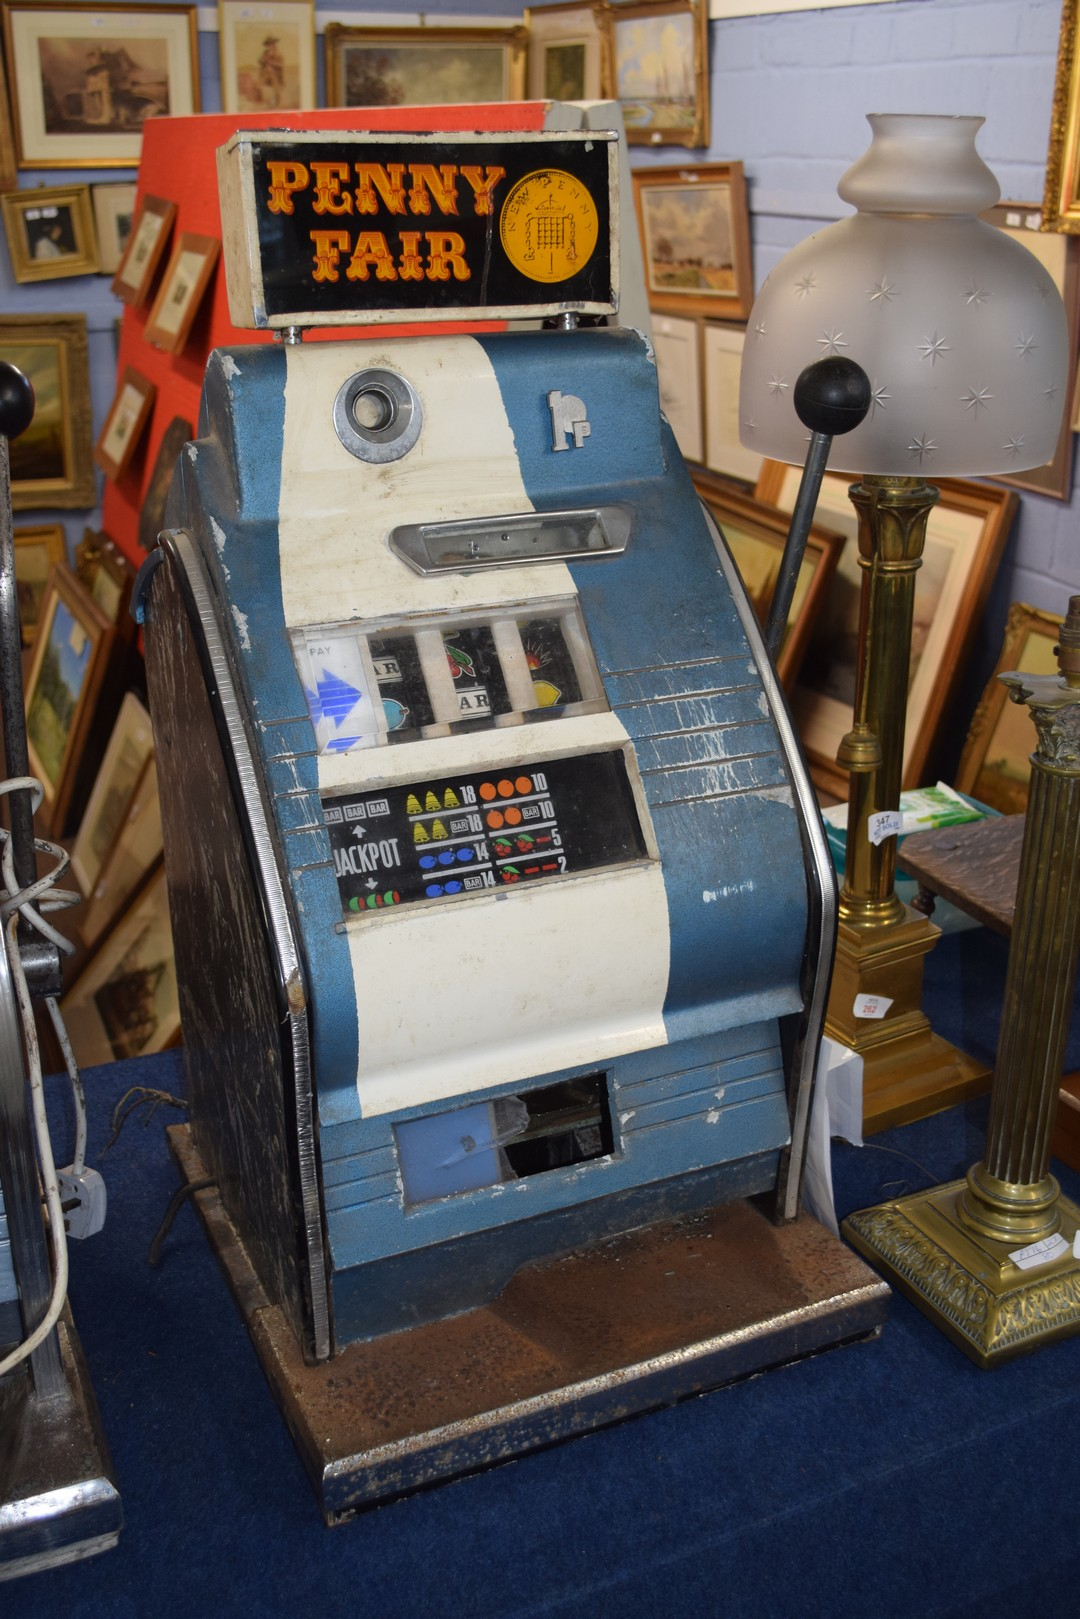 Vintage penny fair one armed bandit fruit machine, 79cm high Condition: